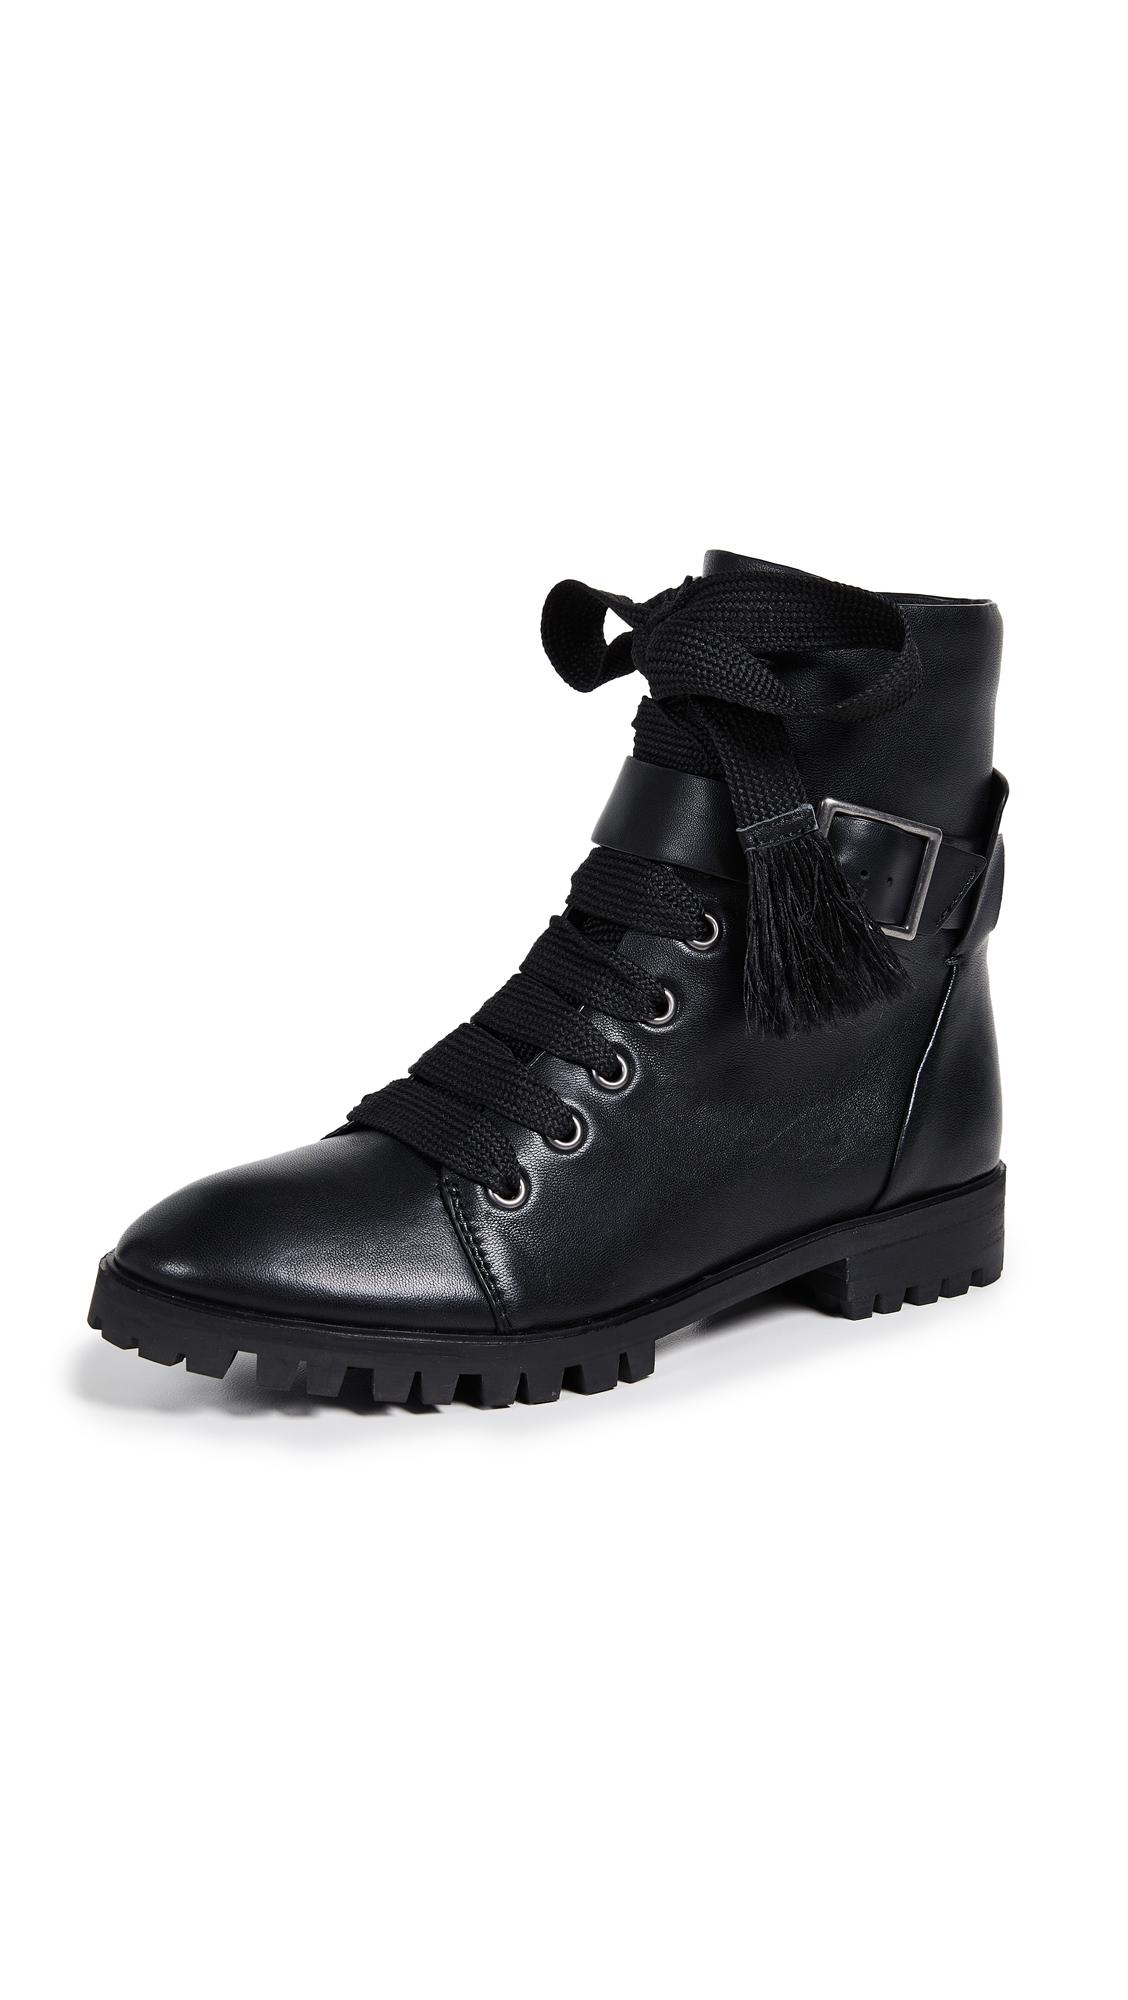 Celine Combat Boots, Black Leather